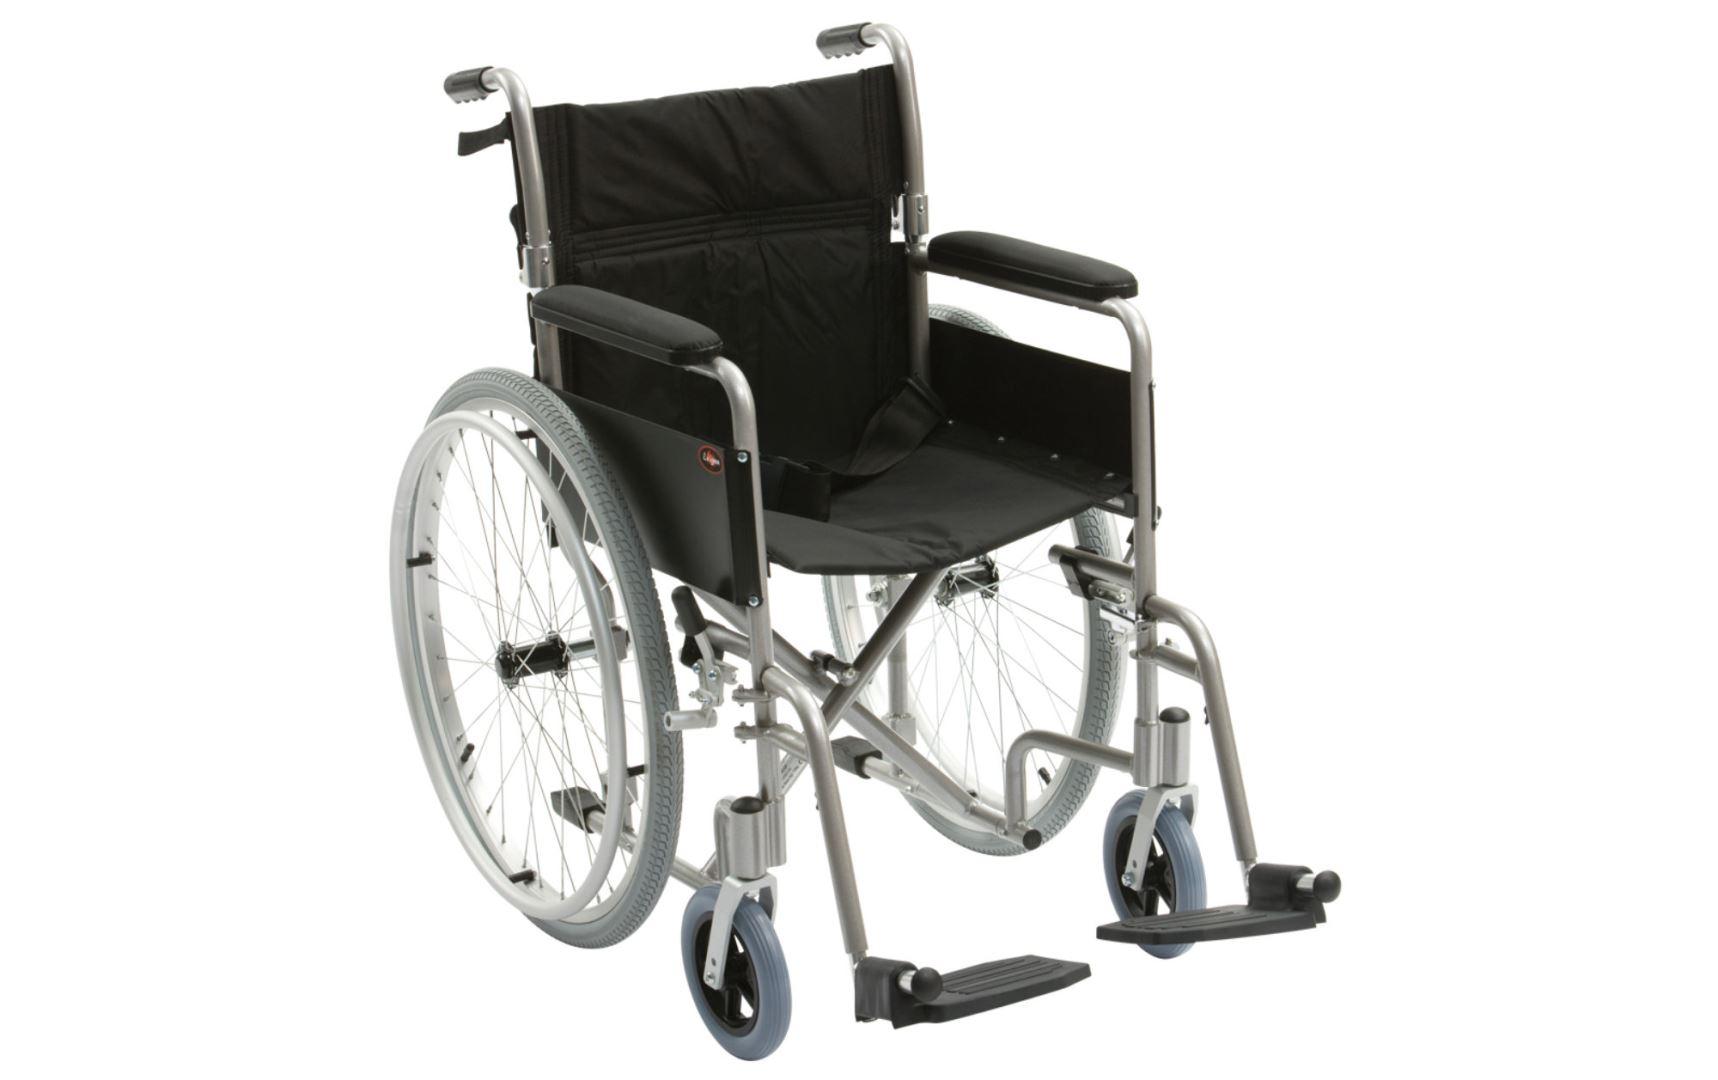 Aluminum Self Propel Wheelchair | Self Propel | Ableworld